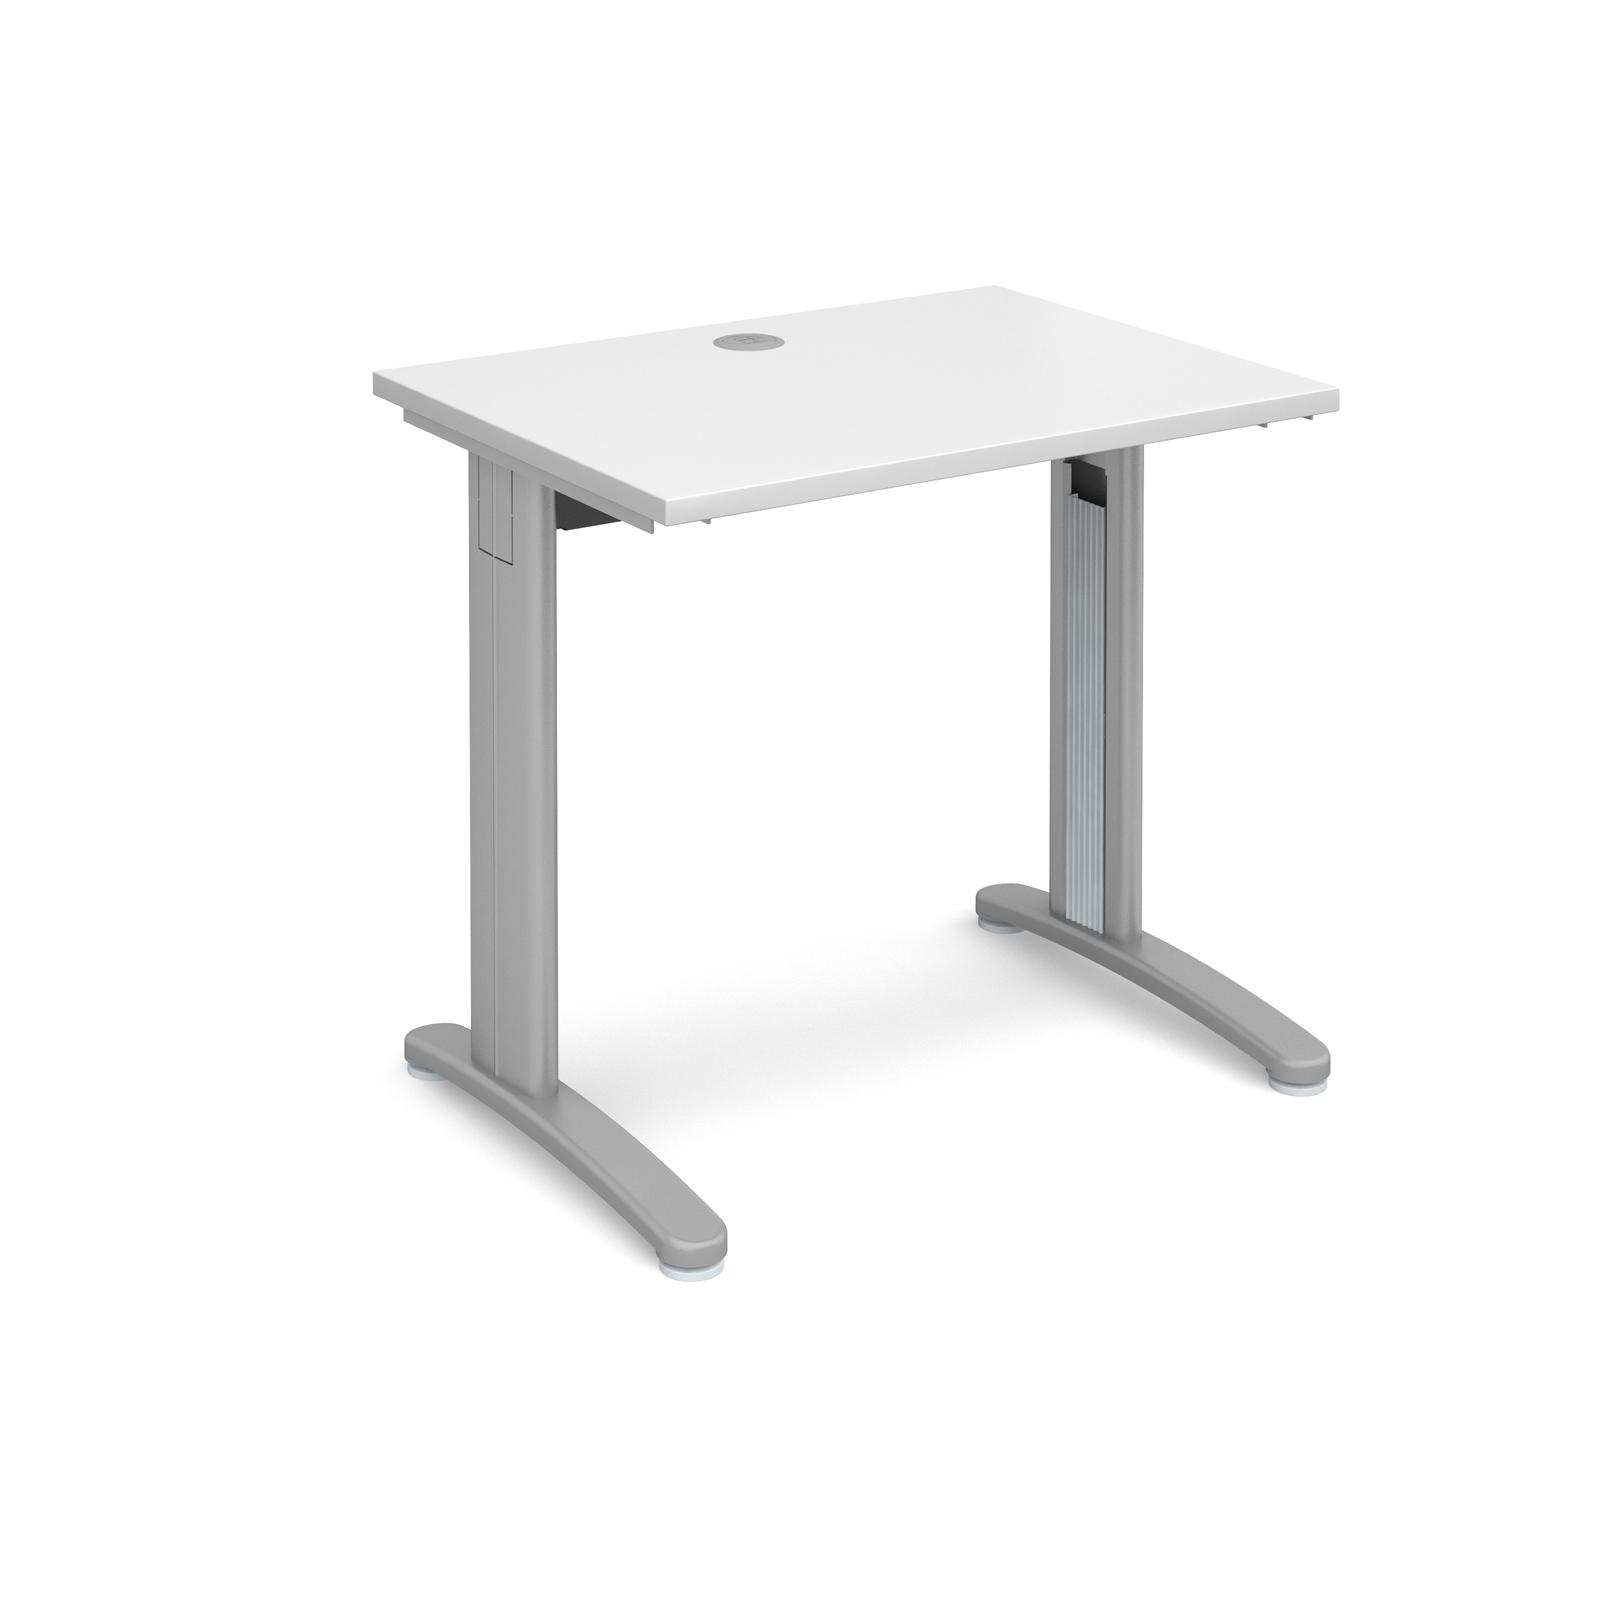 Dams TR10 White Desk | Straight 600 Deep